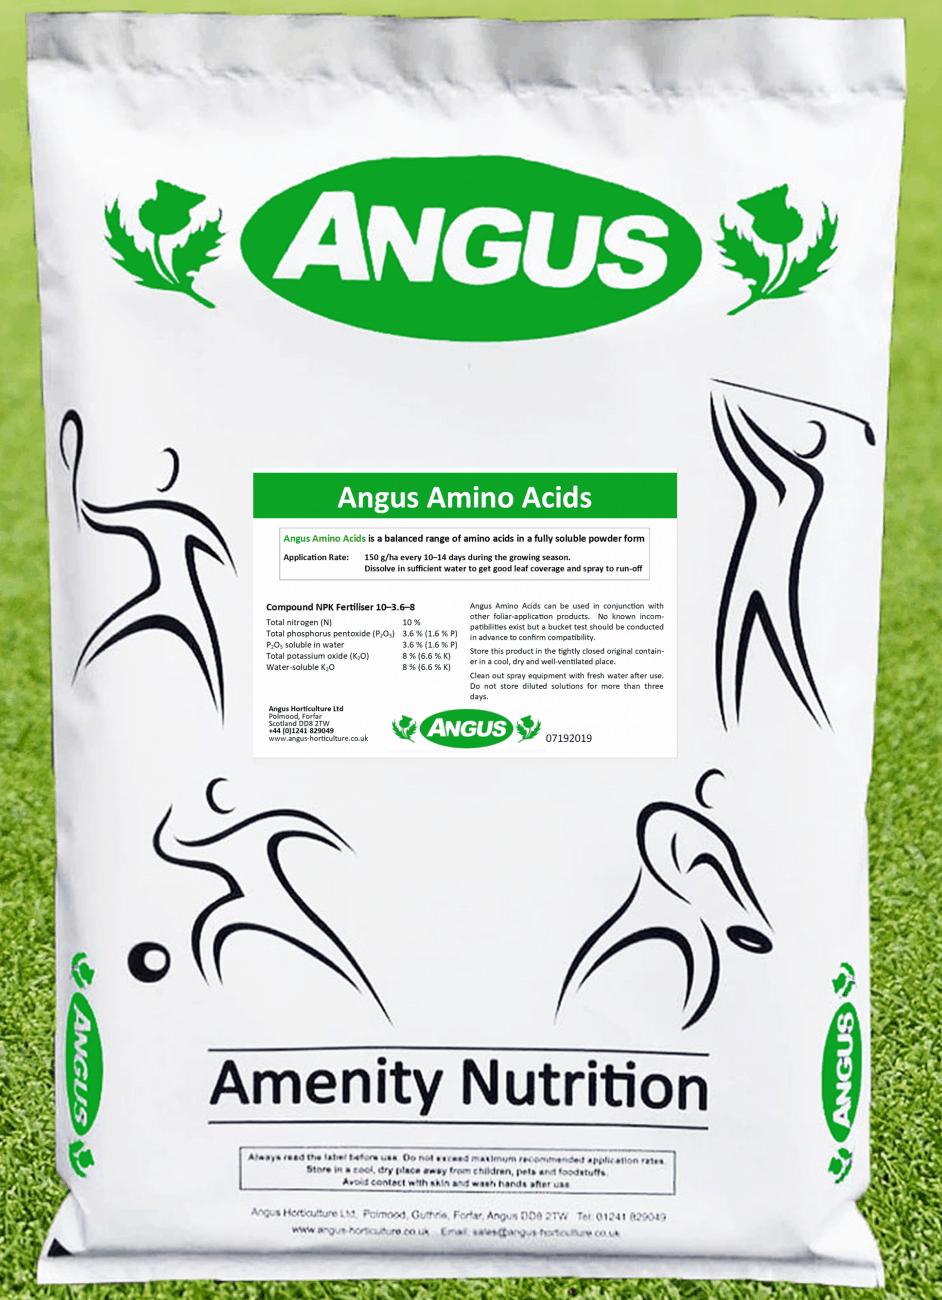 Product image of Angus Amino Acids